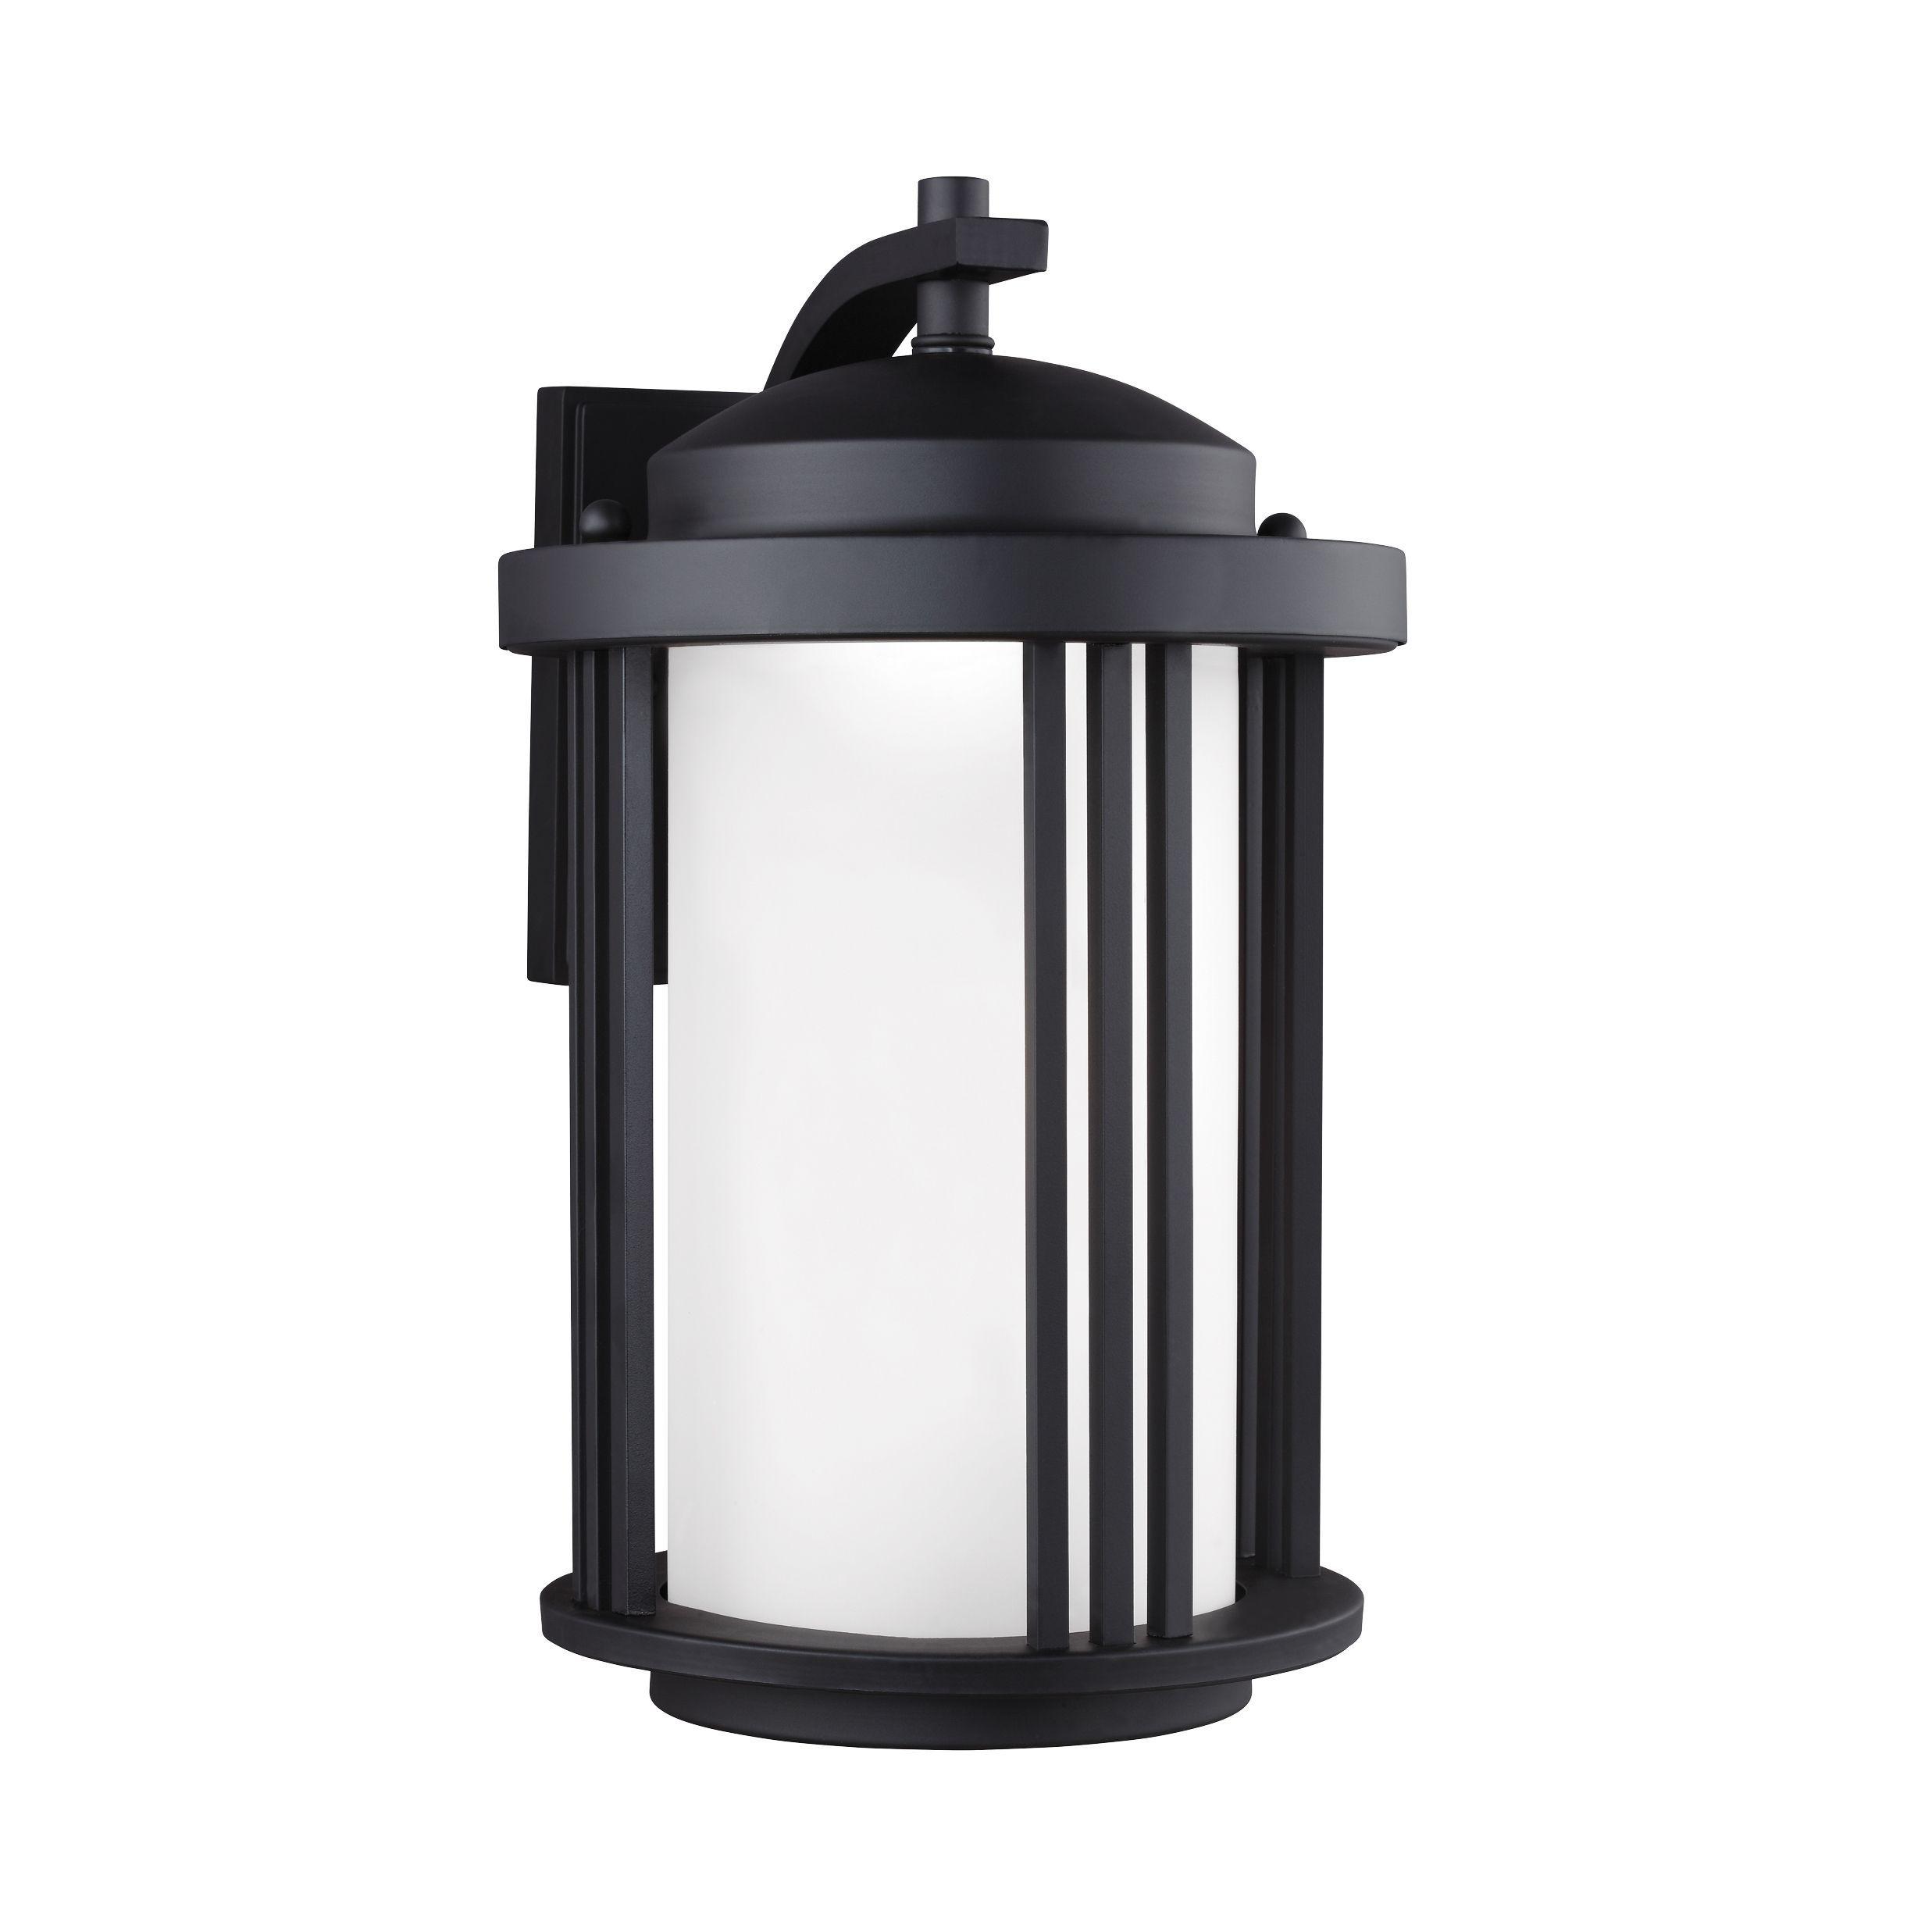 Sea gull crowell led light black outdoor fixture medium led outdoor